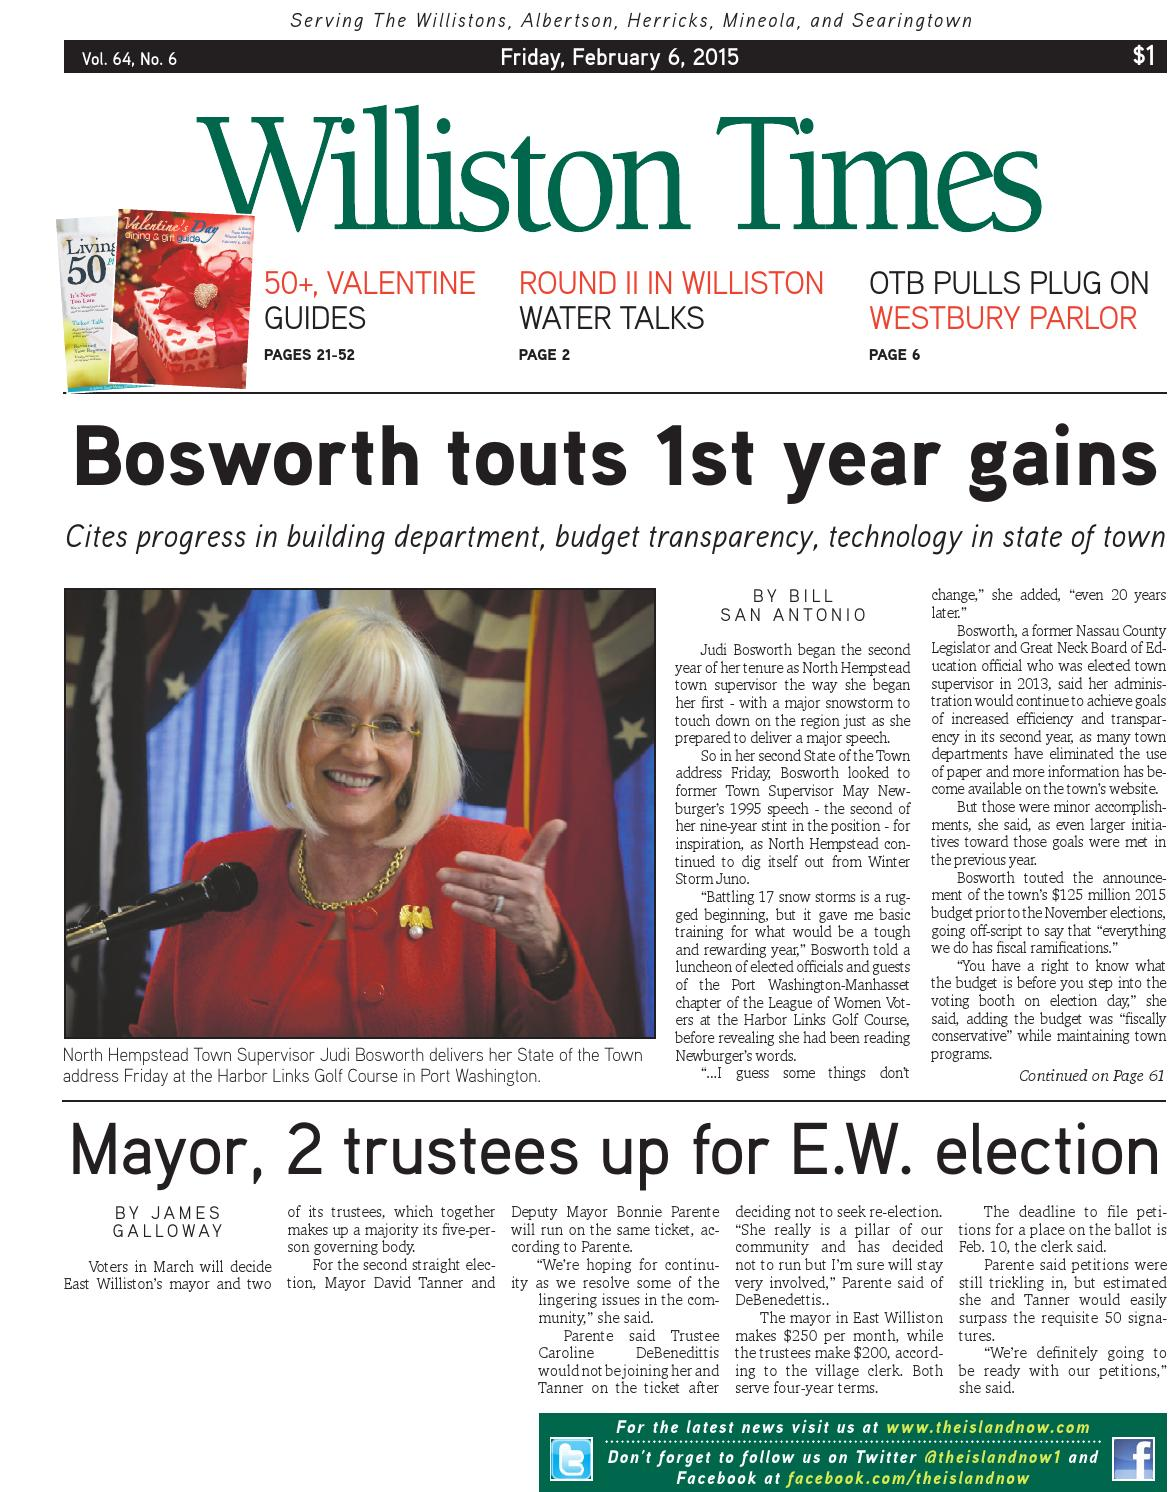 4adba7c5e3d Williston Times 2.6.15 by The Island Now - issuu